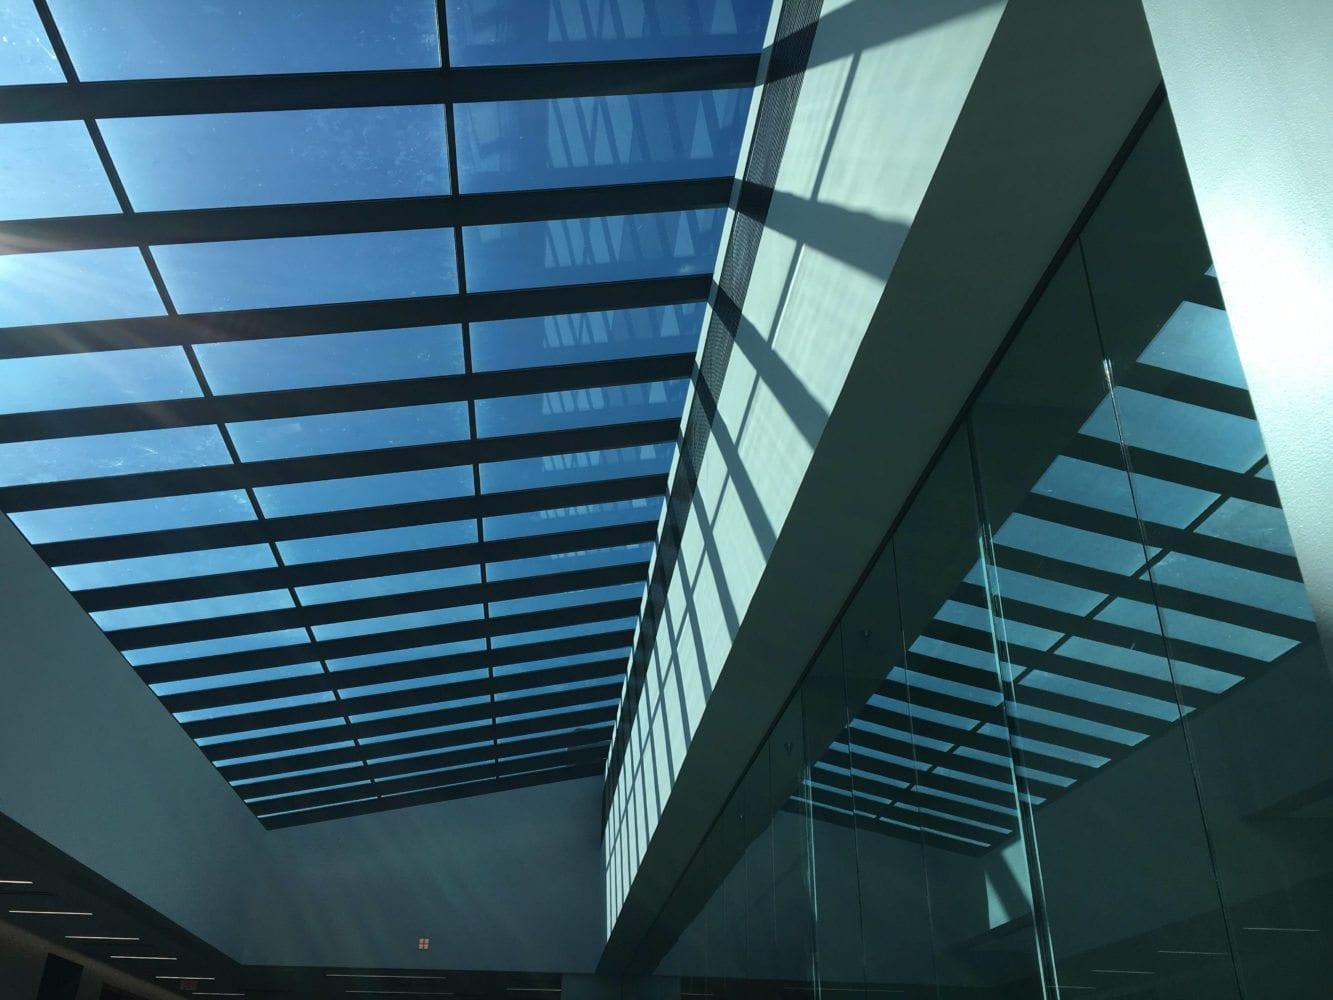 missouri-state-university-glass-hall-ceiling.